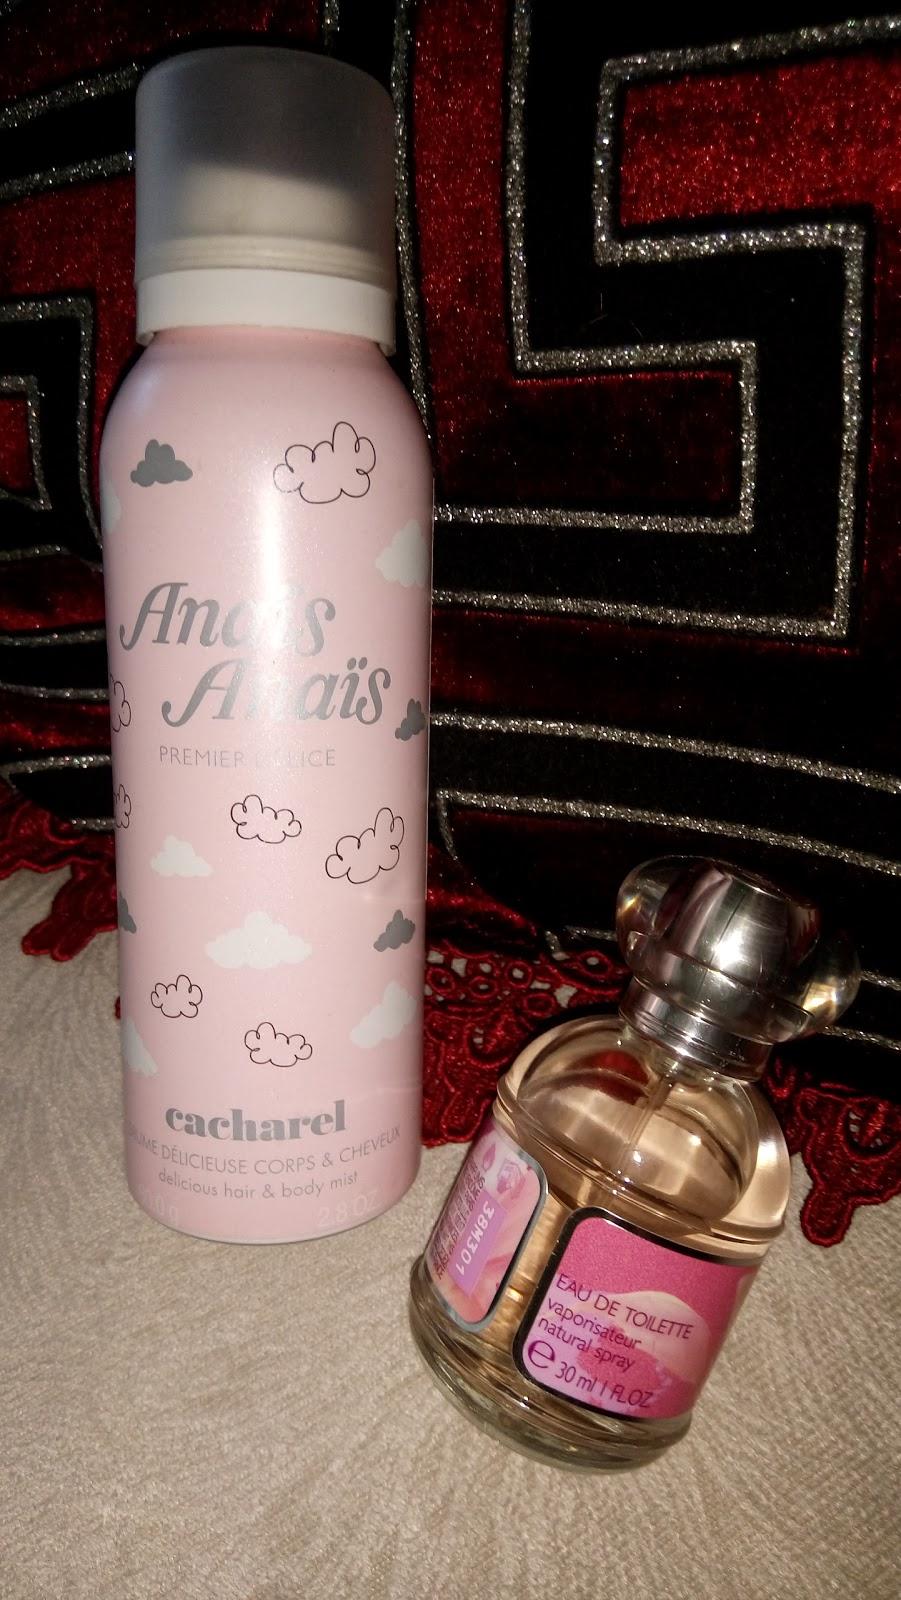 e0c717262e Anaïs Anaïs Premier Délice Cacharel Eau de Toilette - Perfume Feminino 30ml